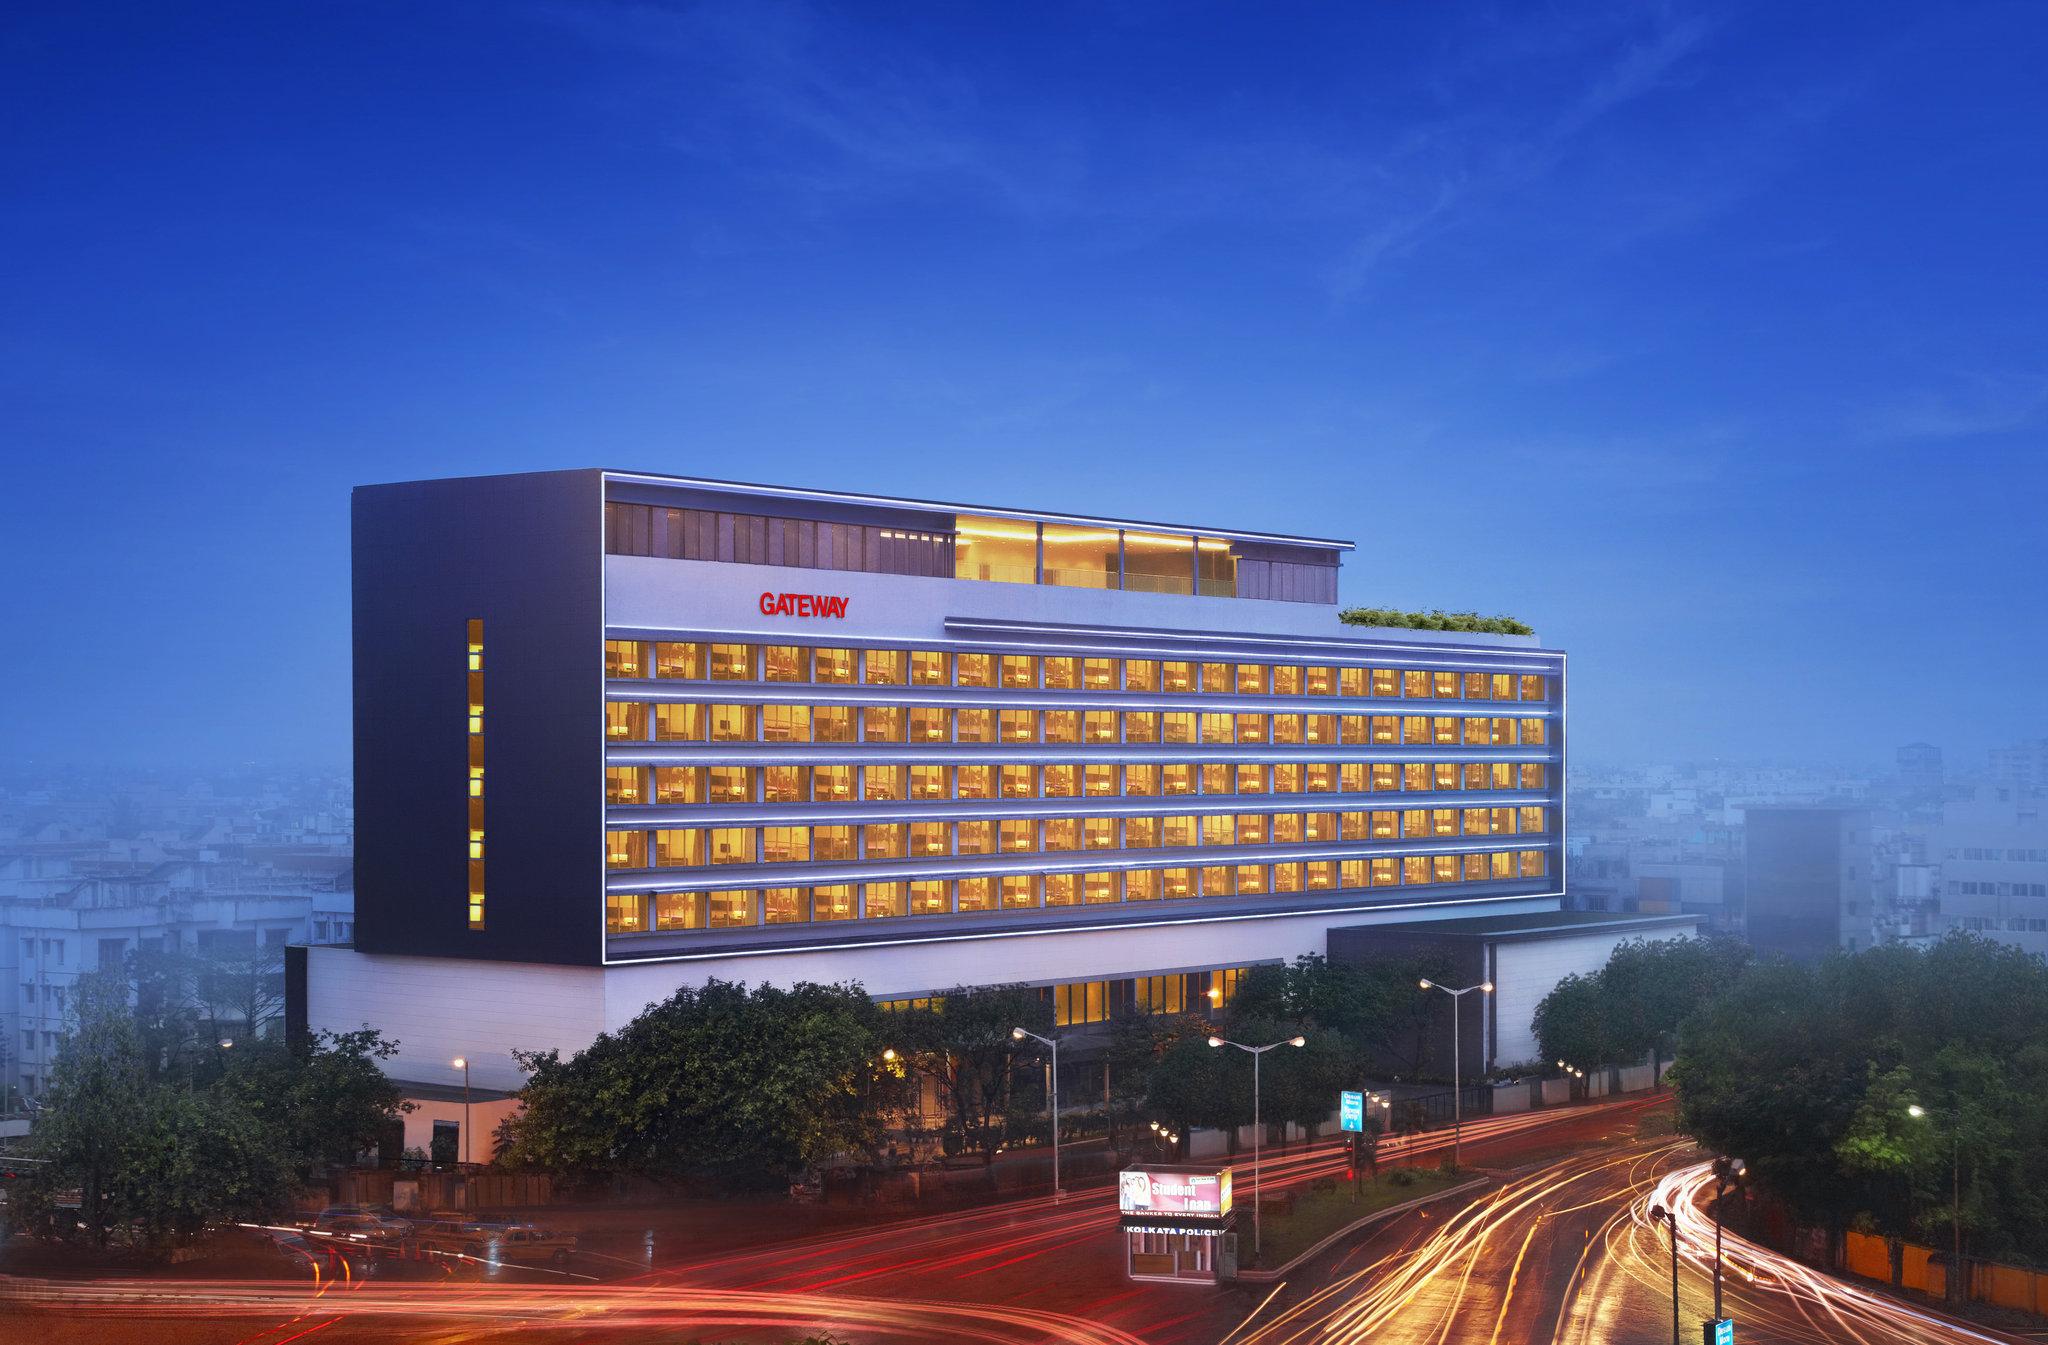 The Gateway Hotel EM Bypass